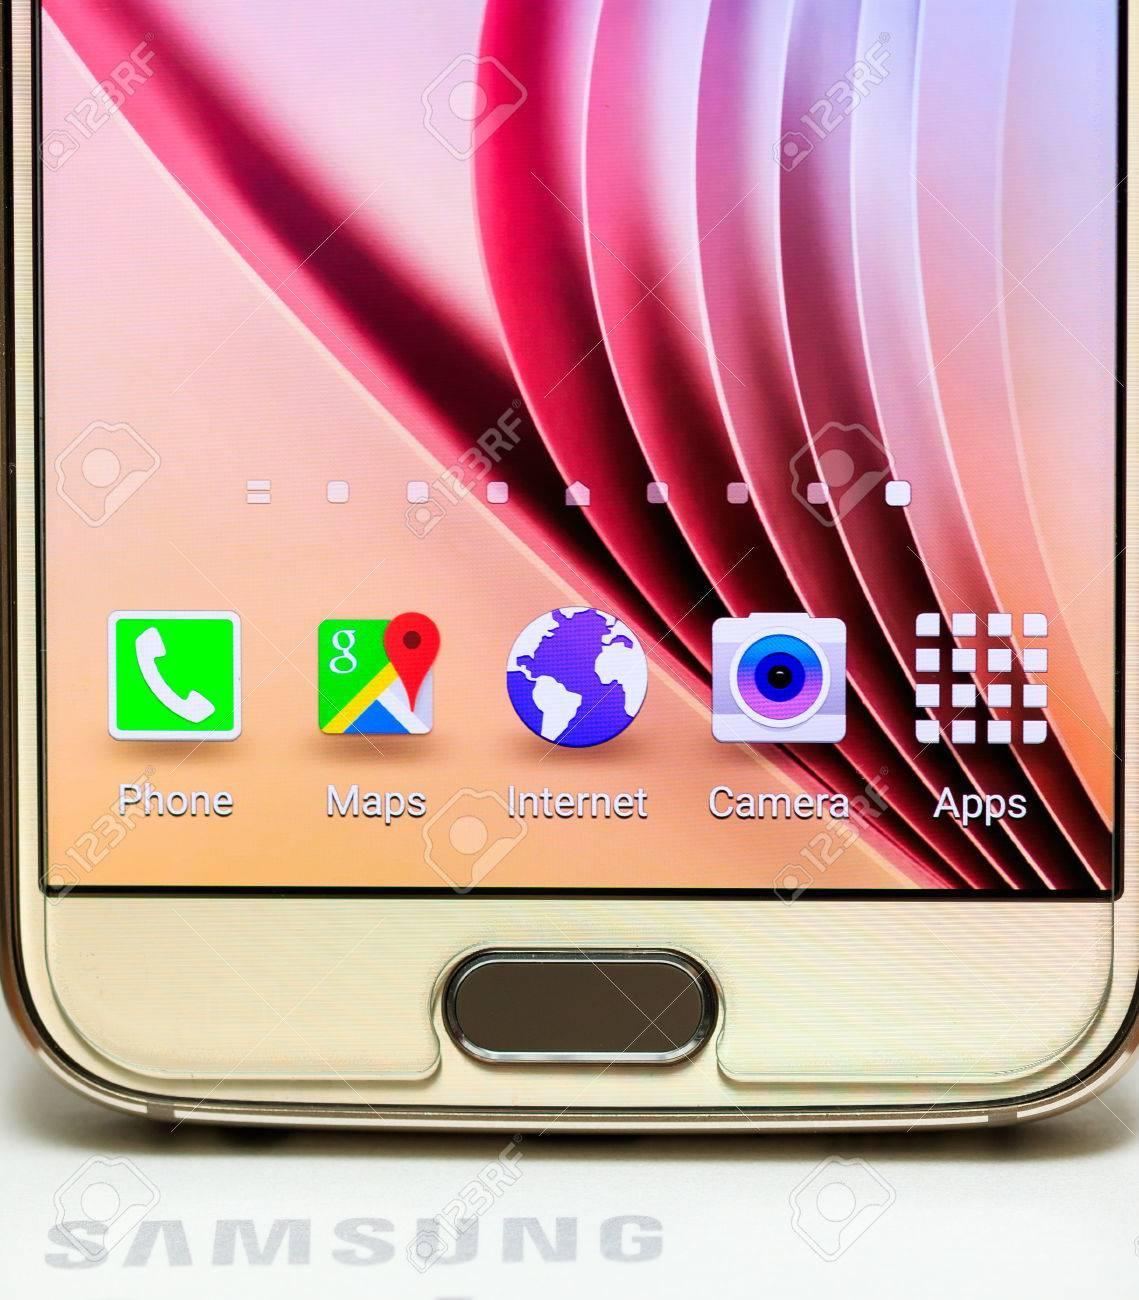 Bottom main button of Samsung Galaxy S6 gold platinum 64 gb edition Stock Photo - 53810986